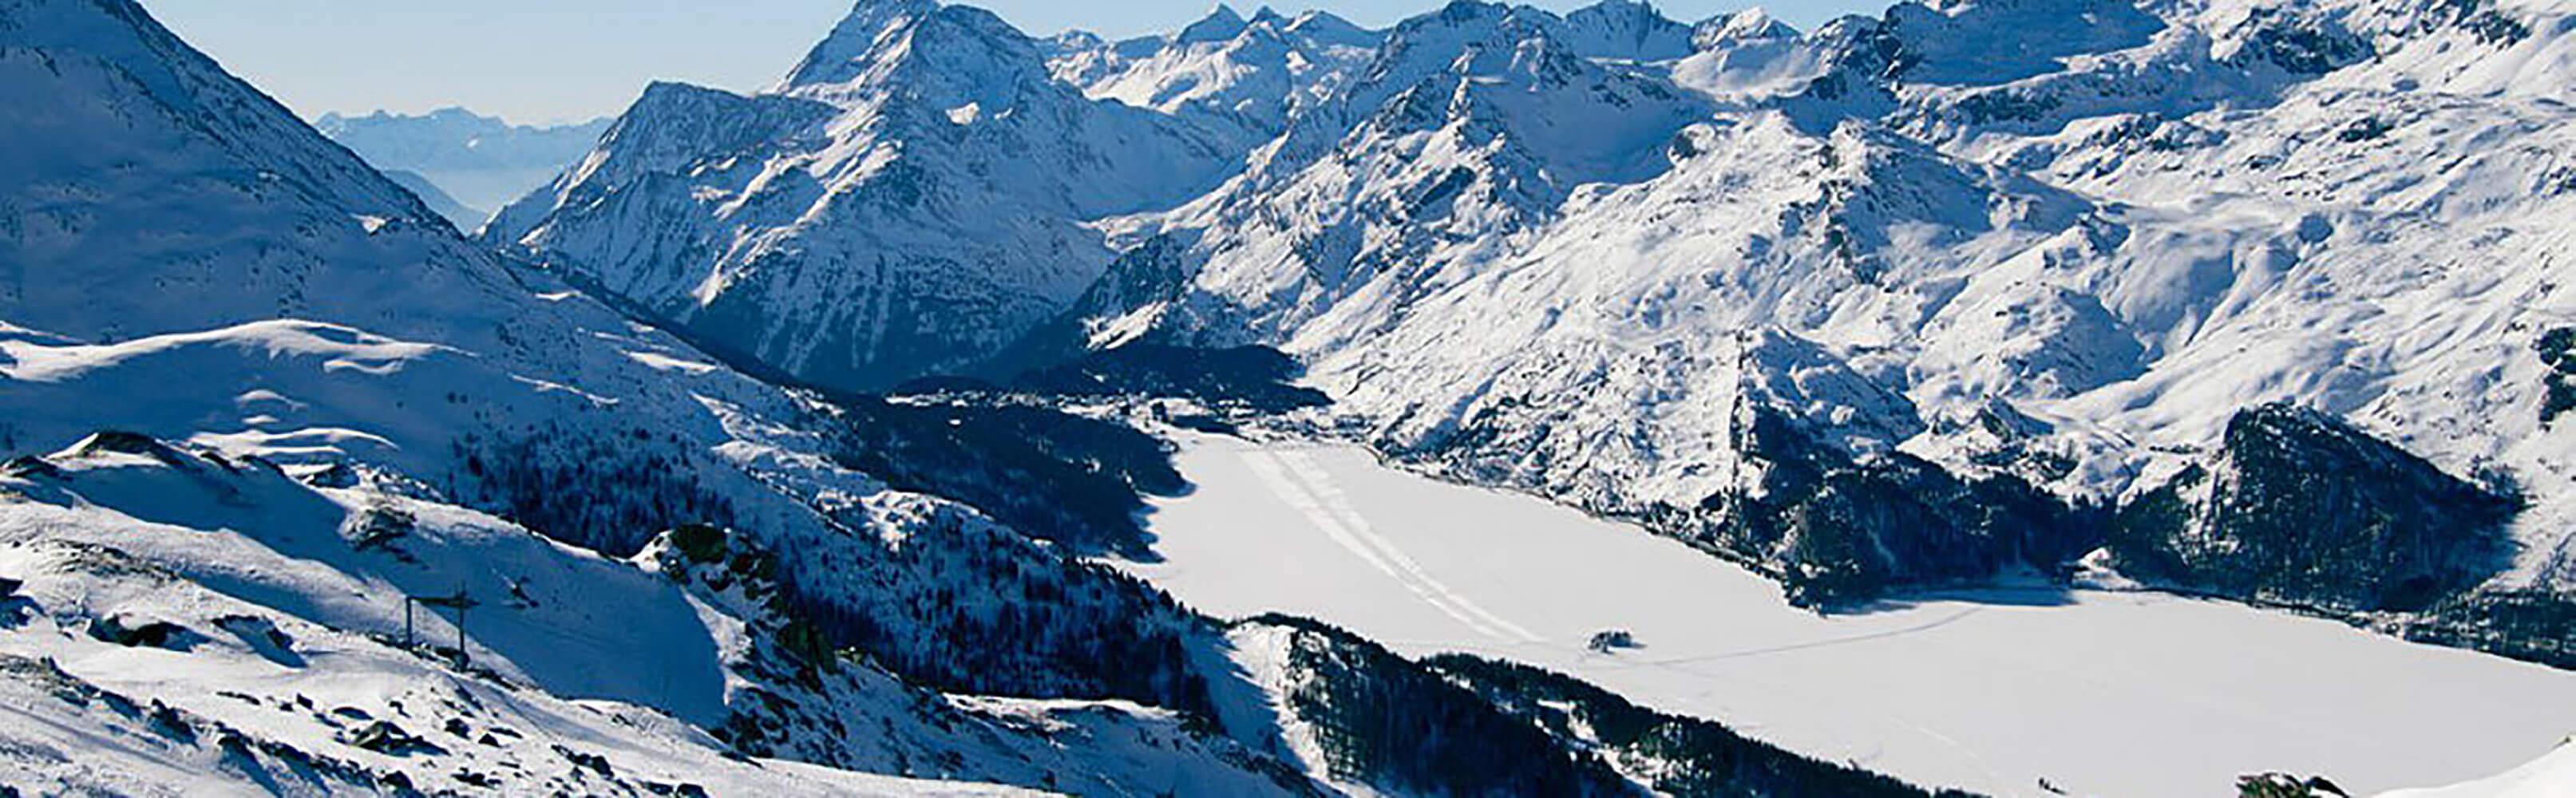 Nira Alpina Hotel im Engadiner Ort Surlej 1